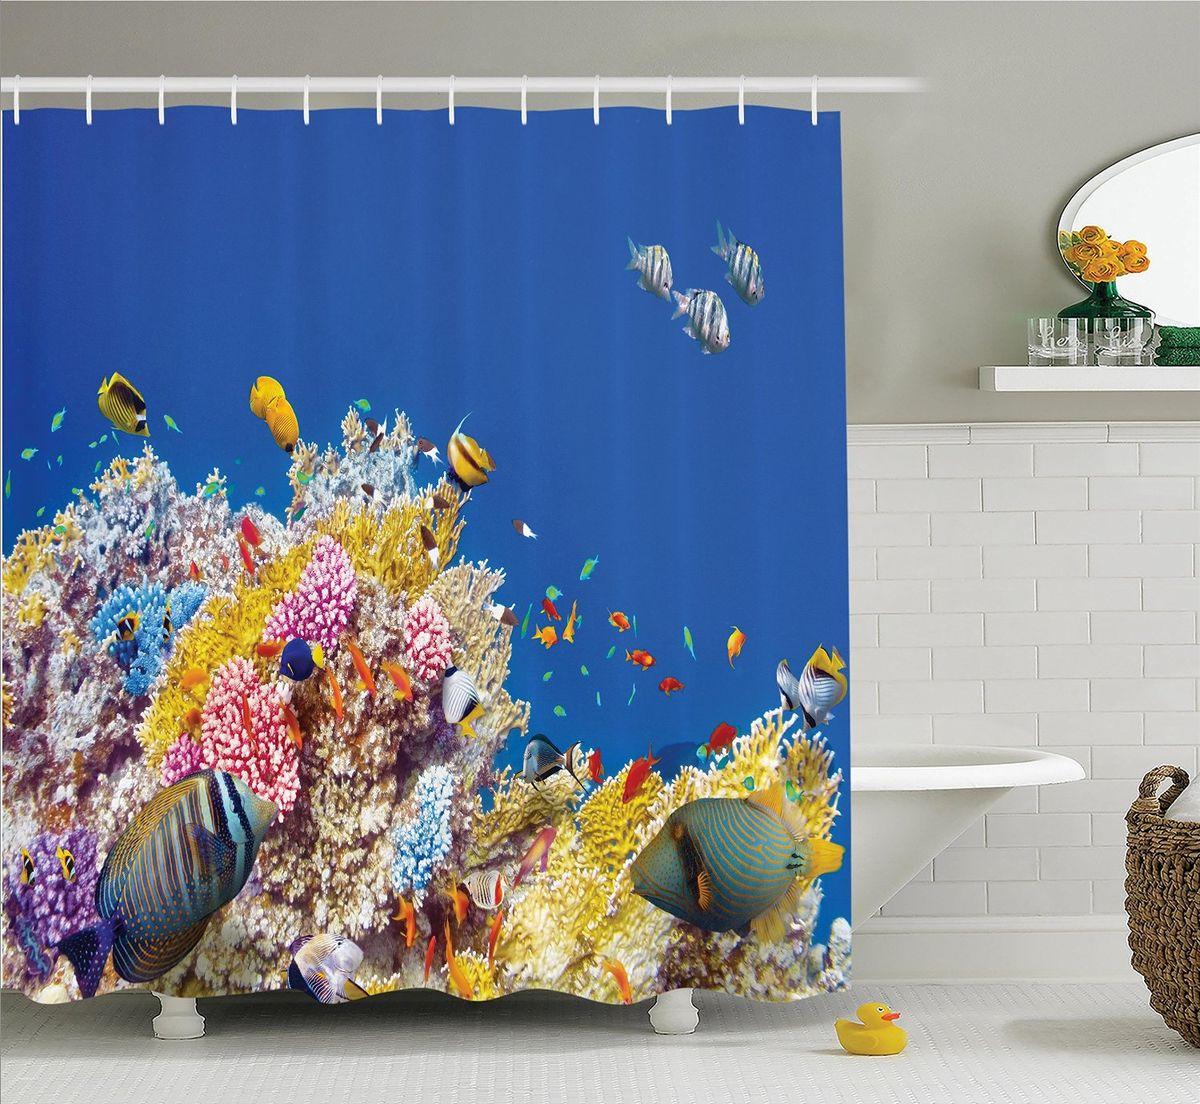 Штора для ванной комнаты Magic Lady Обитатели глубин, 180 х 200 см